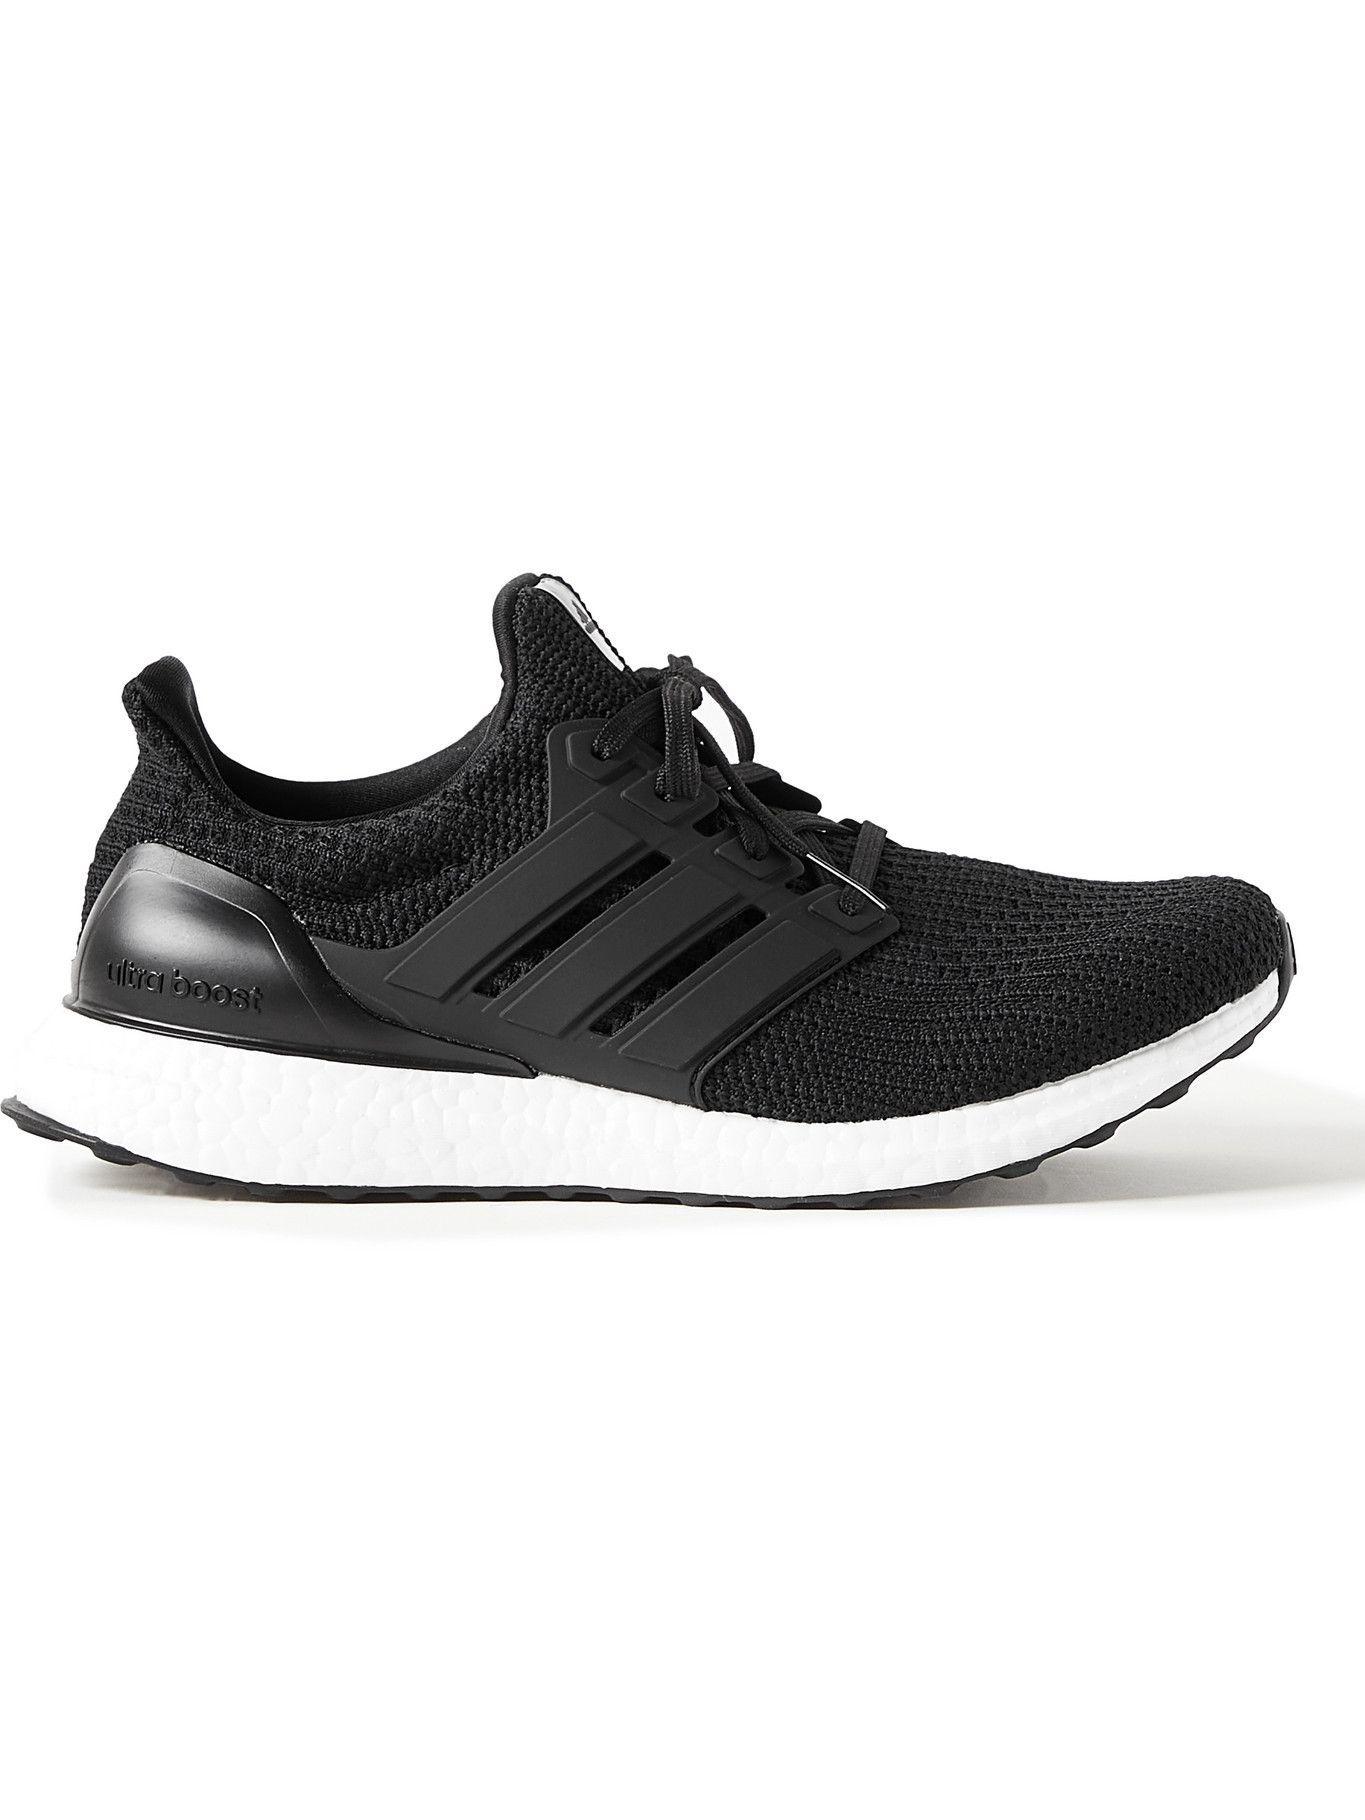 Photo: adidas Sport - UltraBoost 4.0 DNA Rubber-Trimmed Primeknit Running Sneakers - Black